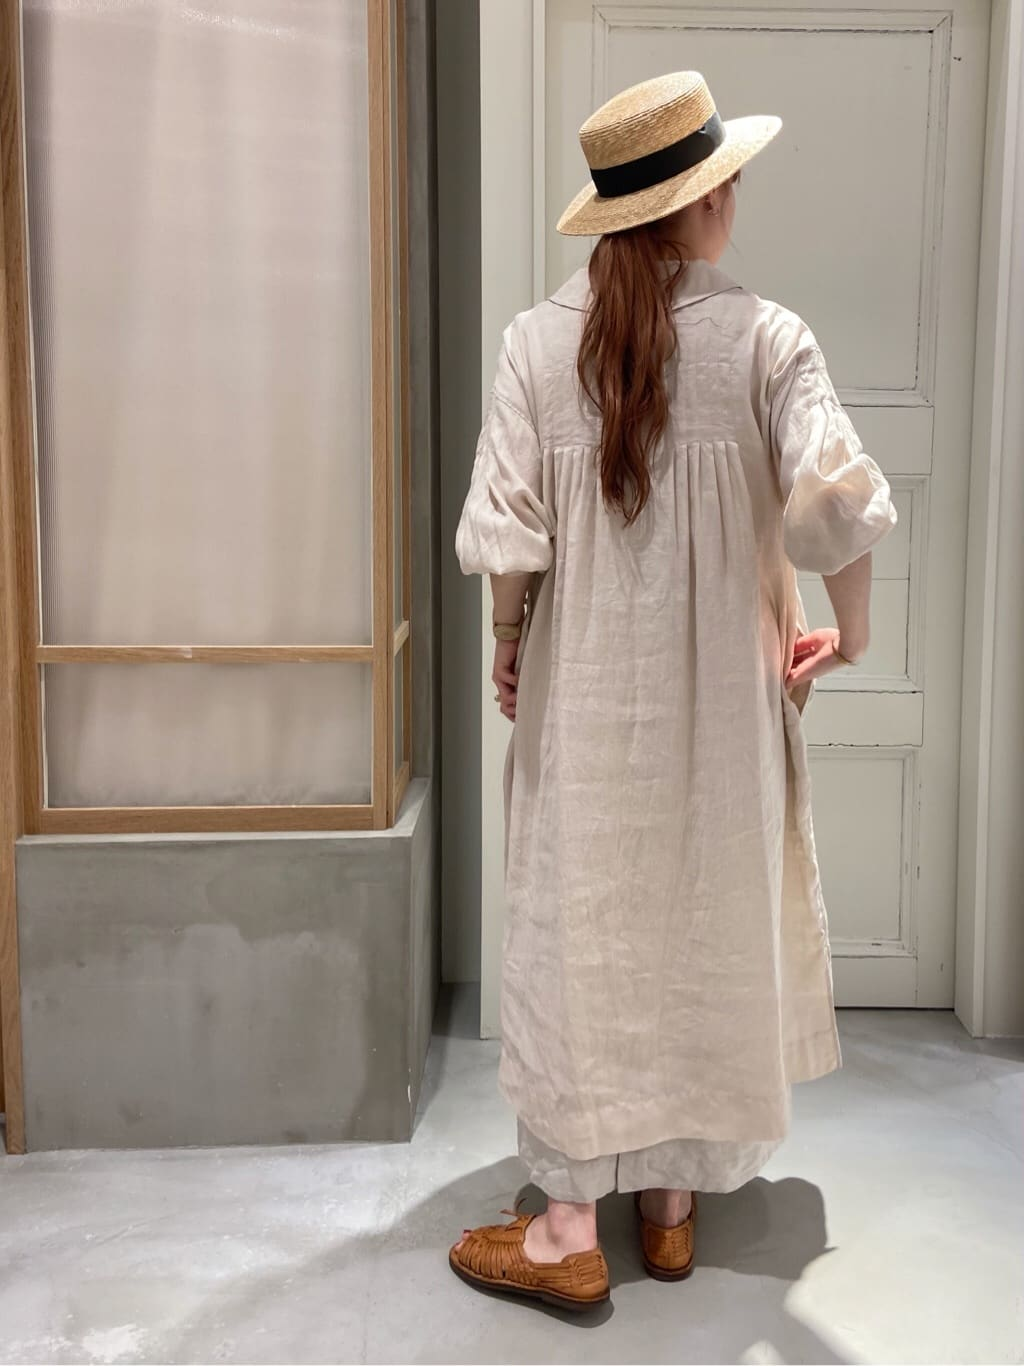 bulle de savon 渋谷スクランブルスクエア 身長:160cm 2021.07.10